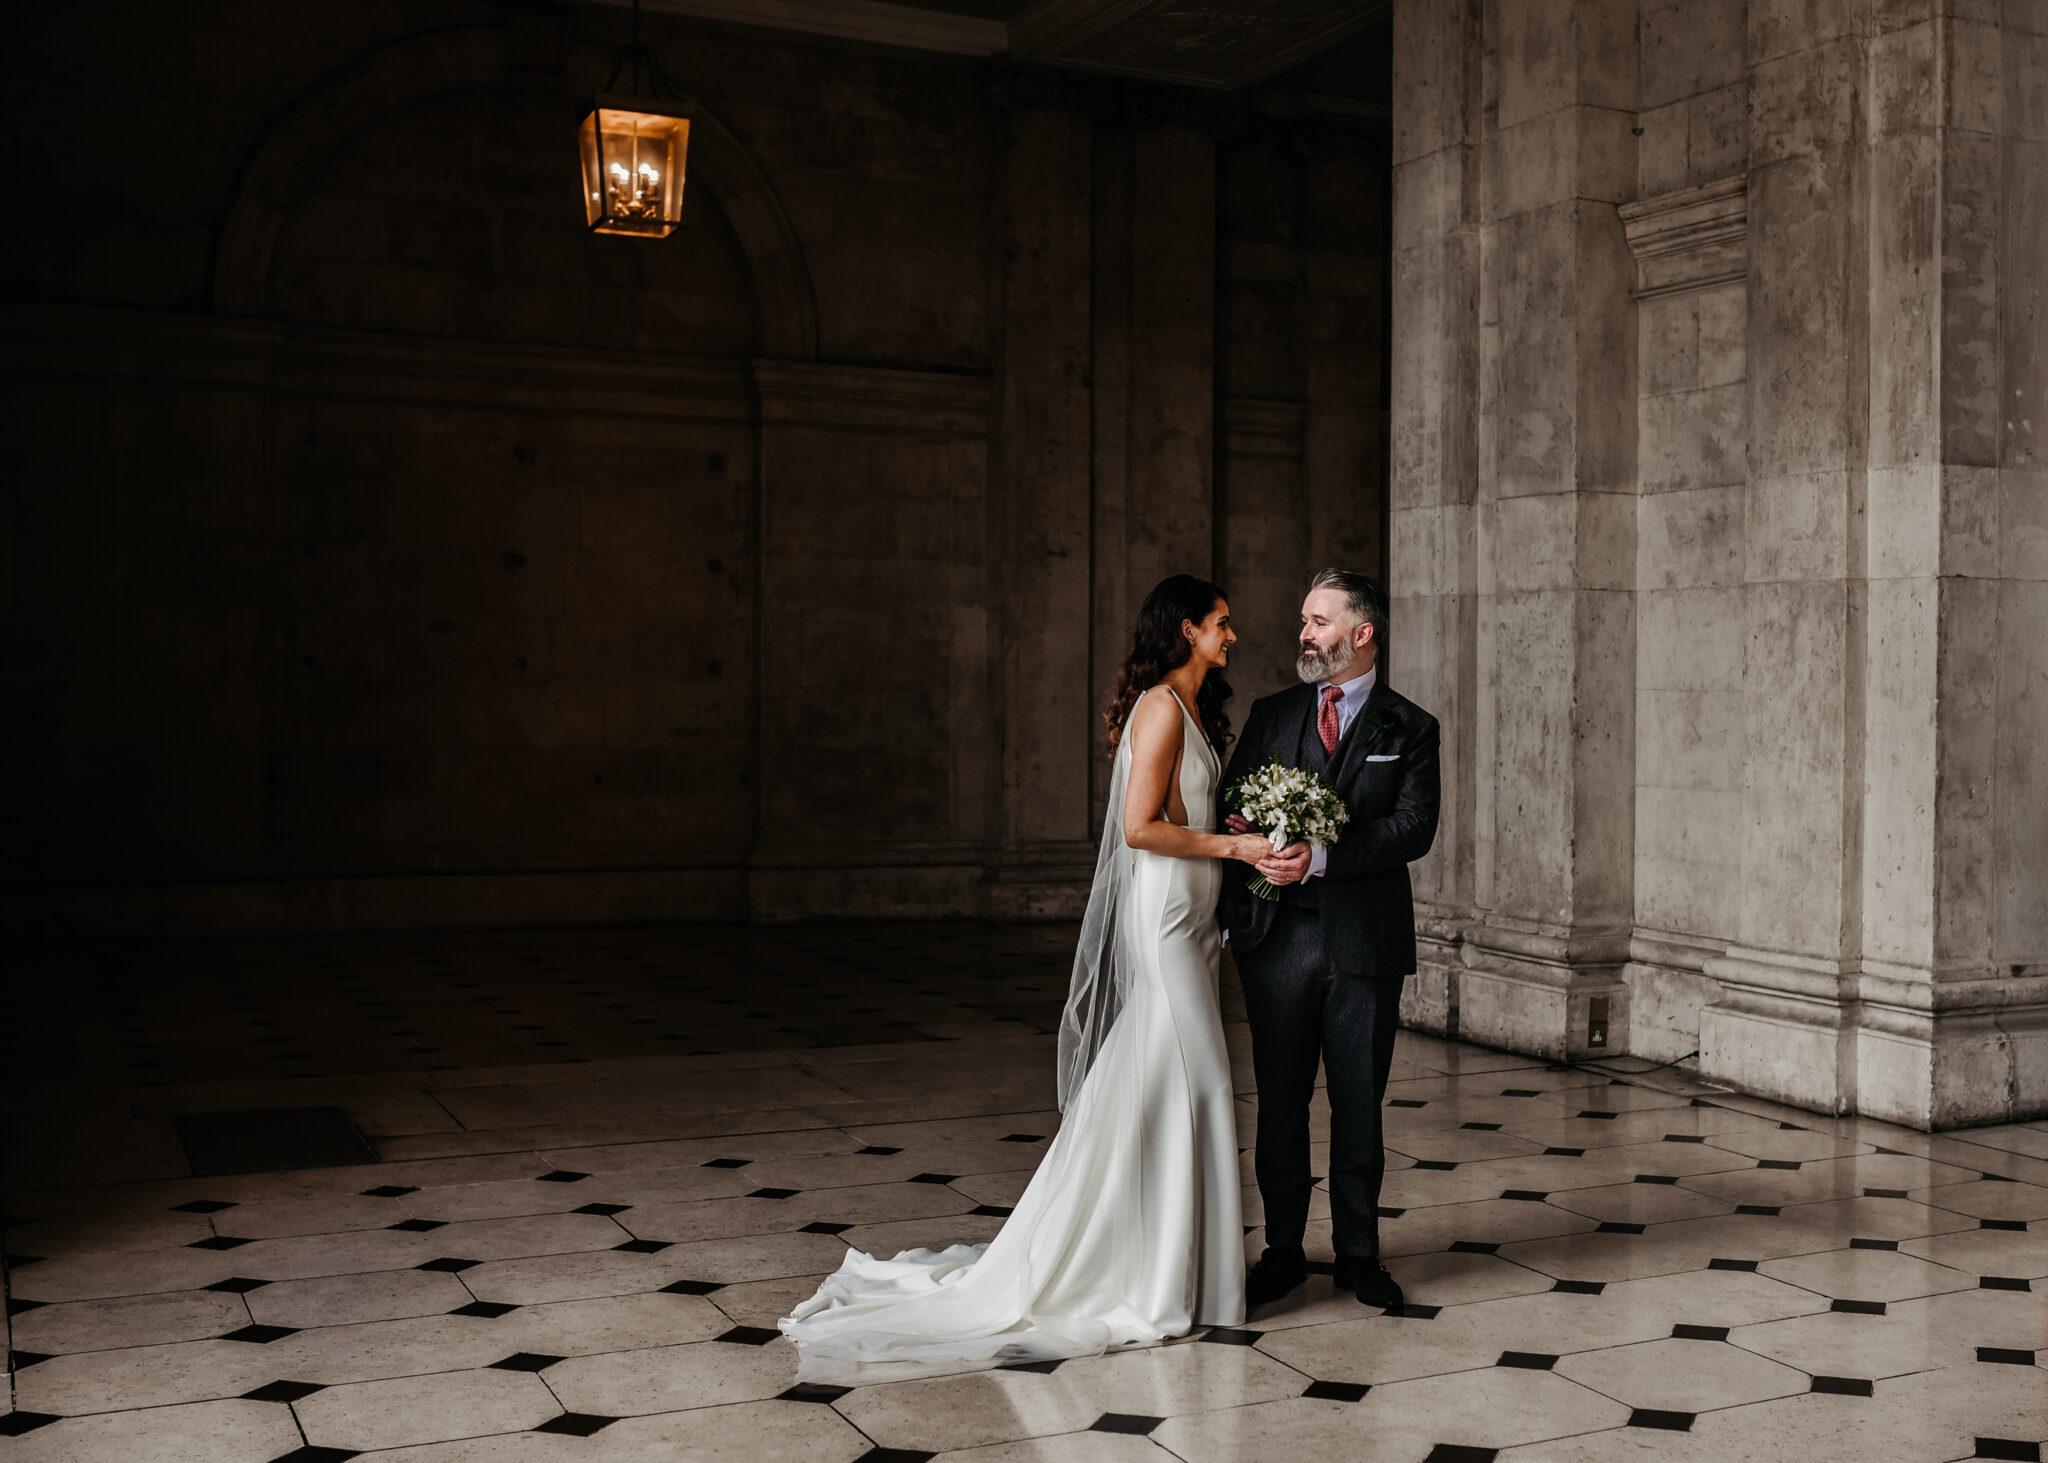 City Hall Wedding Photos Intercontinental Hotel Dublin 25